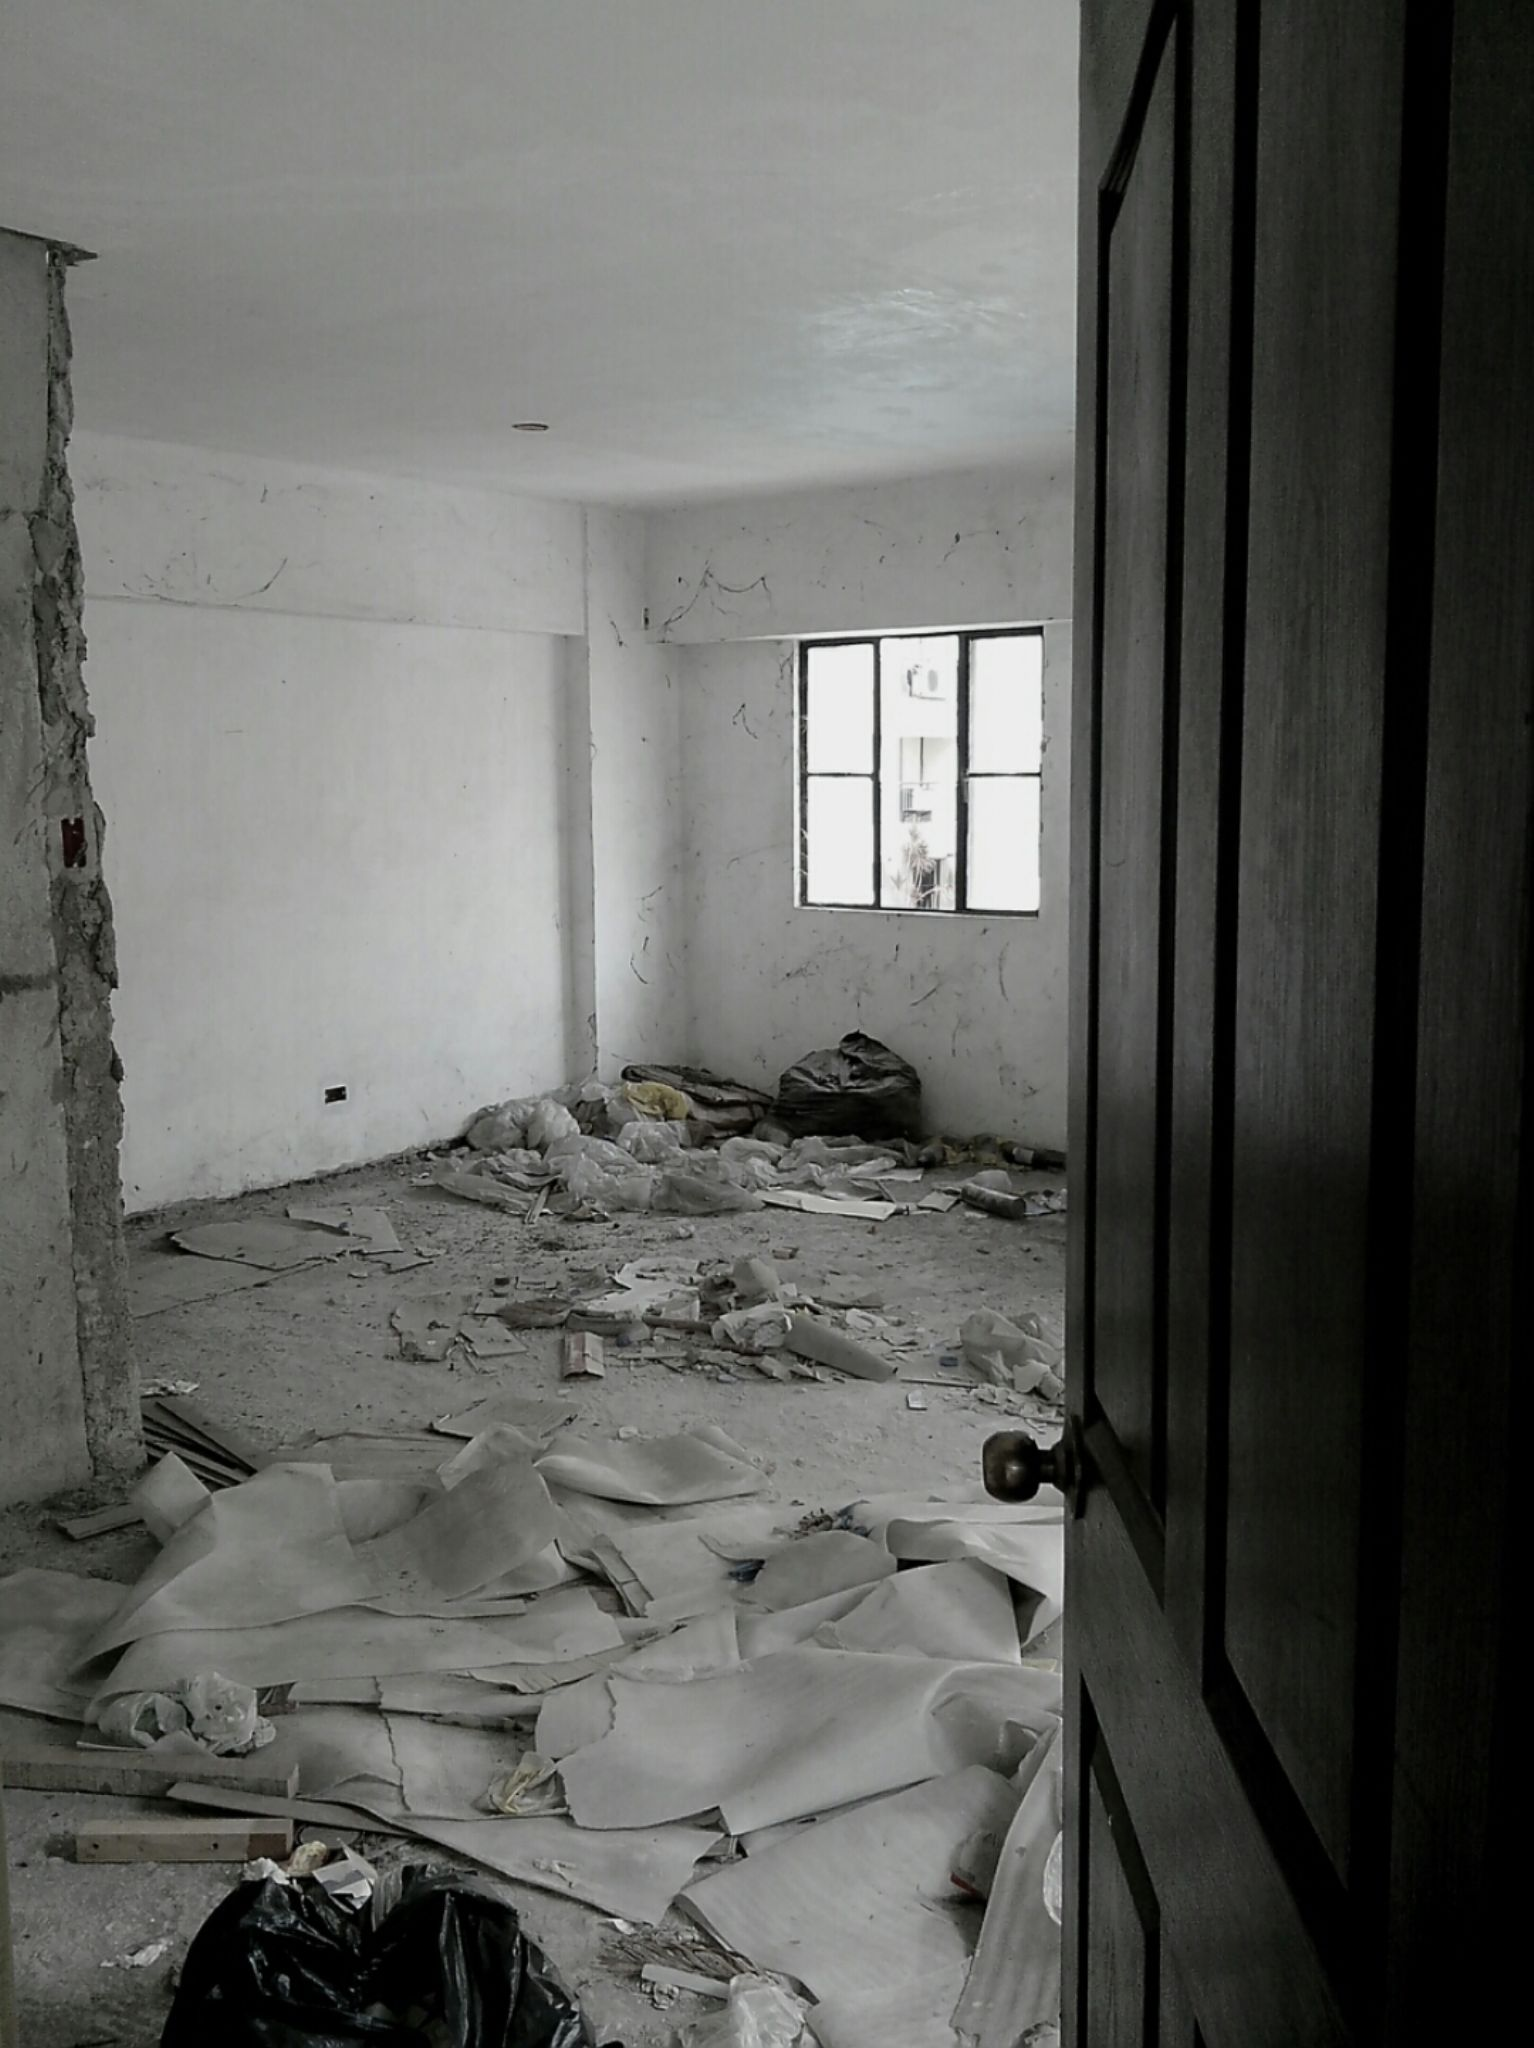 Abandoned Room by jssacaben